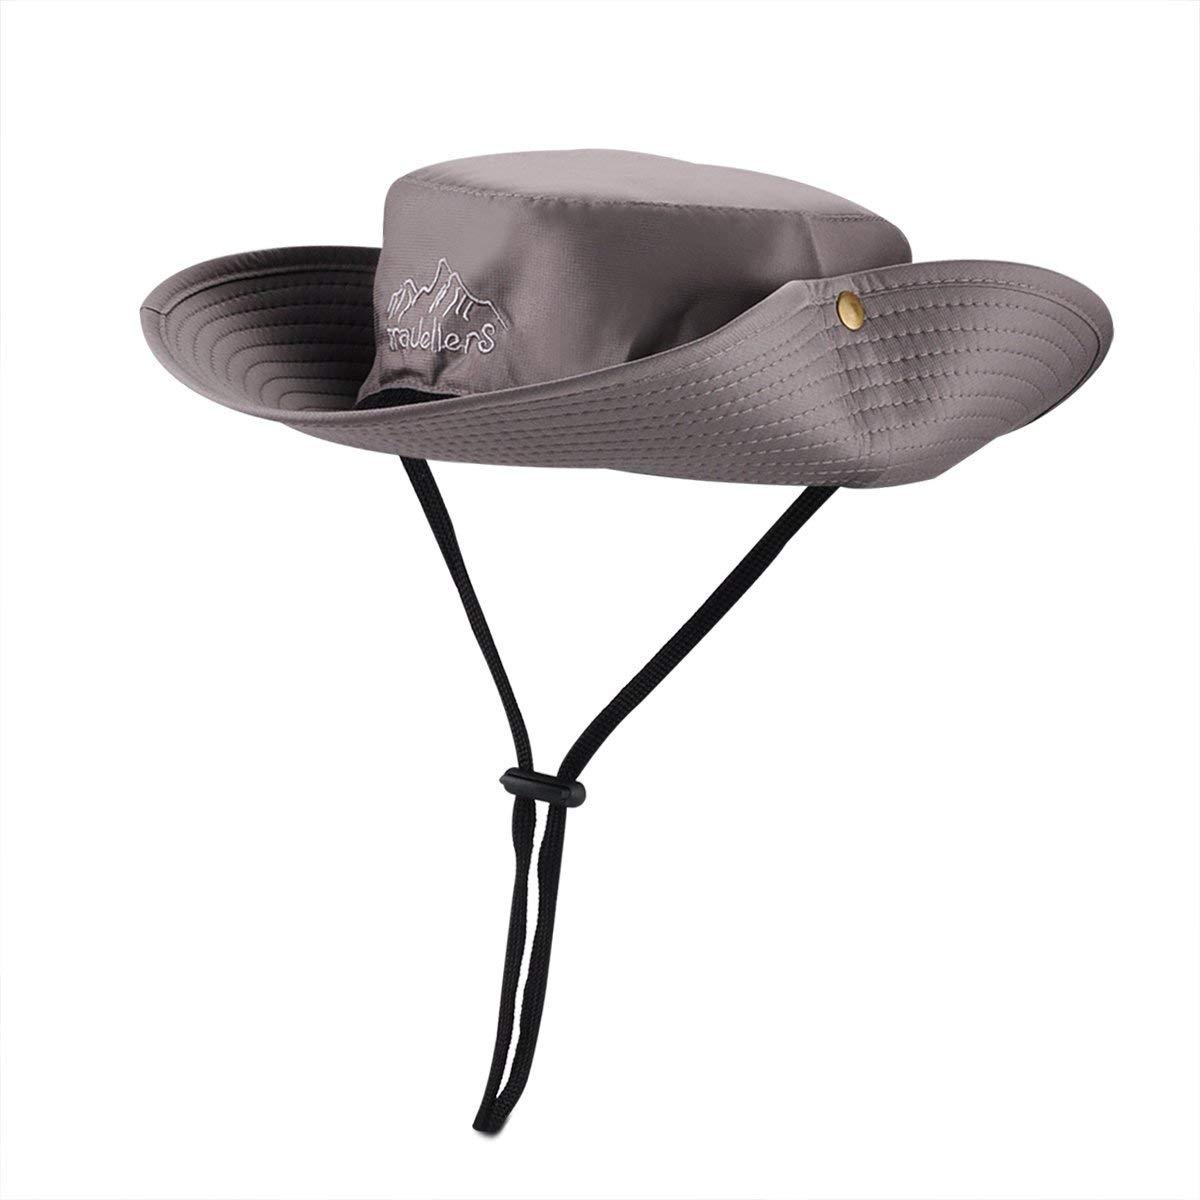 ea5f1652f16 Get Quotations · Wide Brim Waterproof Boonie Fishing Hat